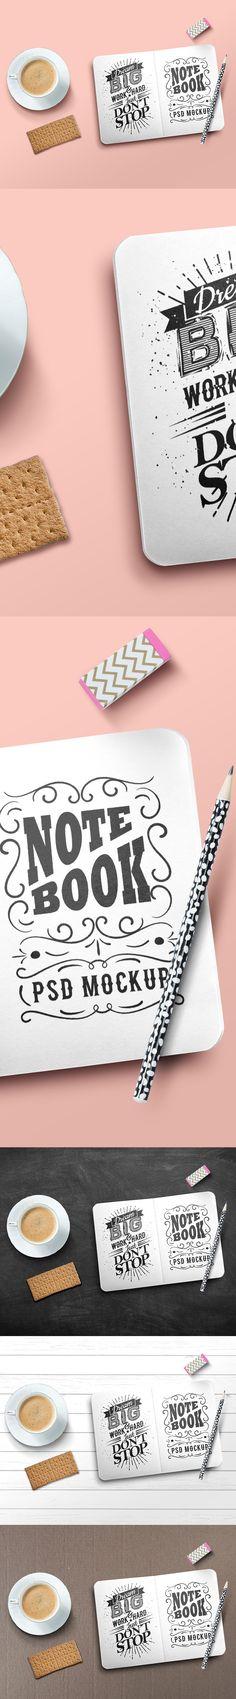 Free Sketchbook Mockup PSD (80 MB) | Graphics Fuel | #free #photoshop #mockup #psd #sketchbook